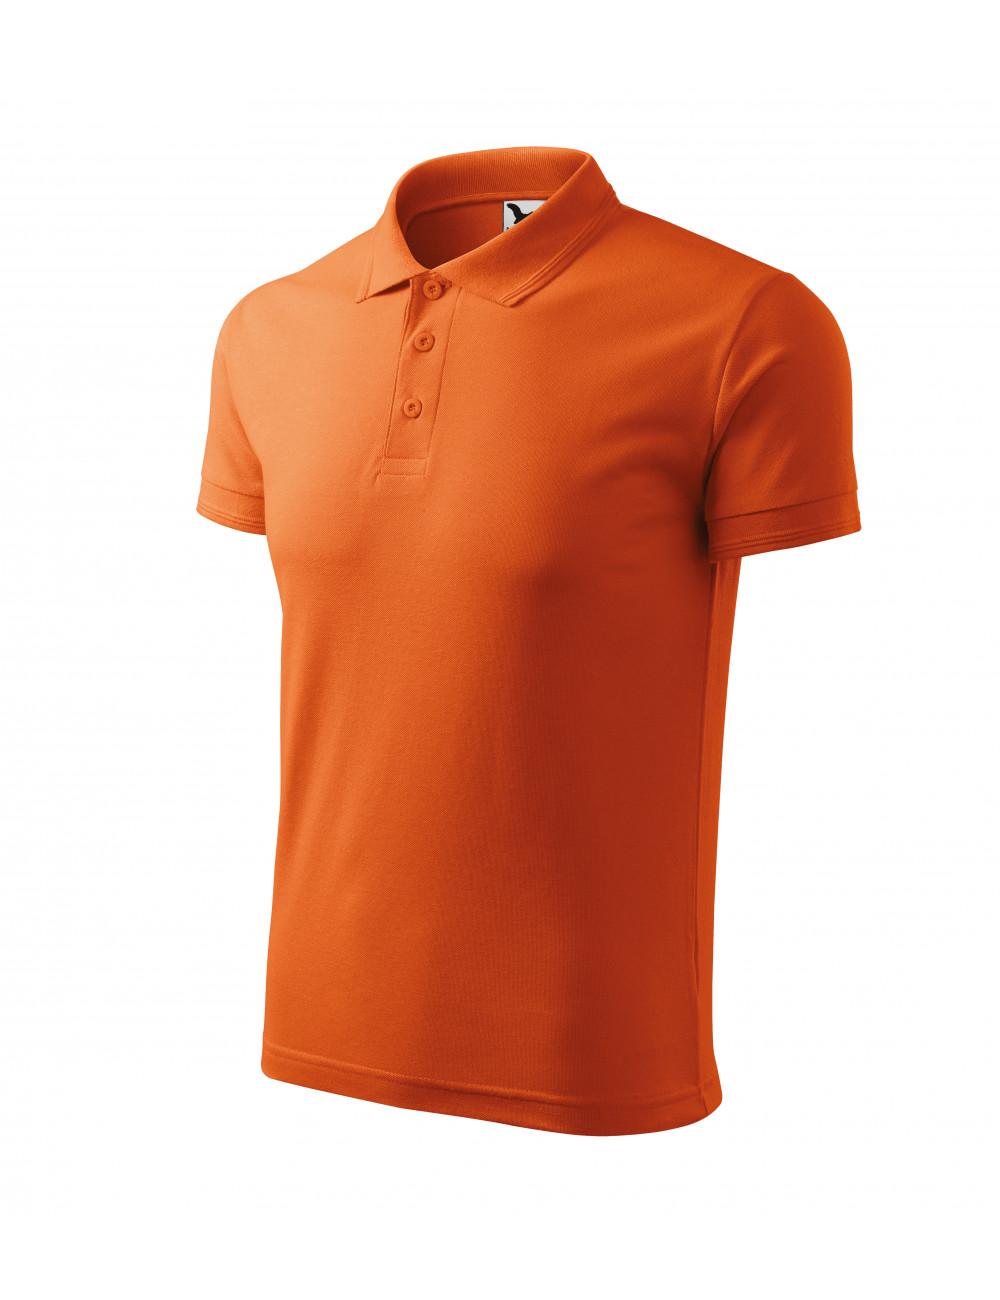 Adler MALFINI Koszulka polo męska Pique Polo 203 pomarańczowy